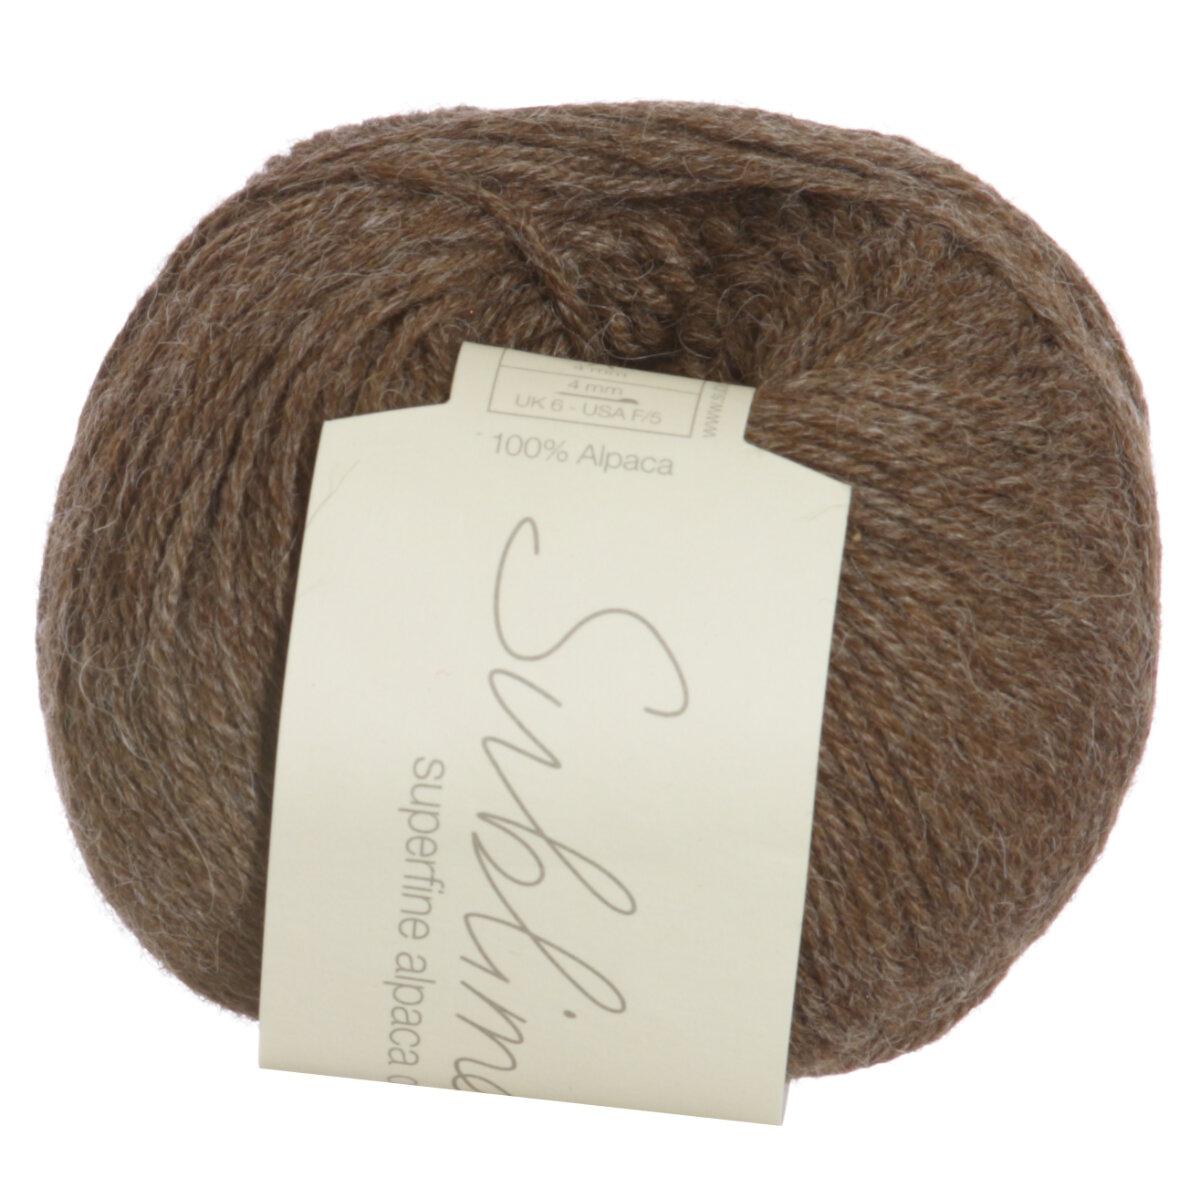 alpaca wool washing instructions